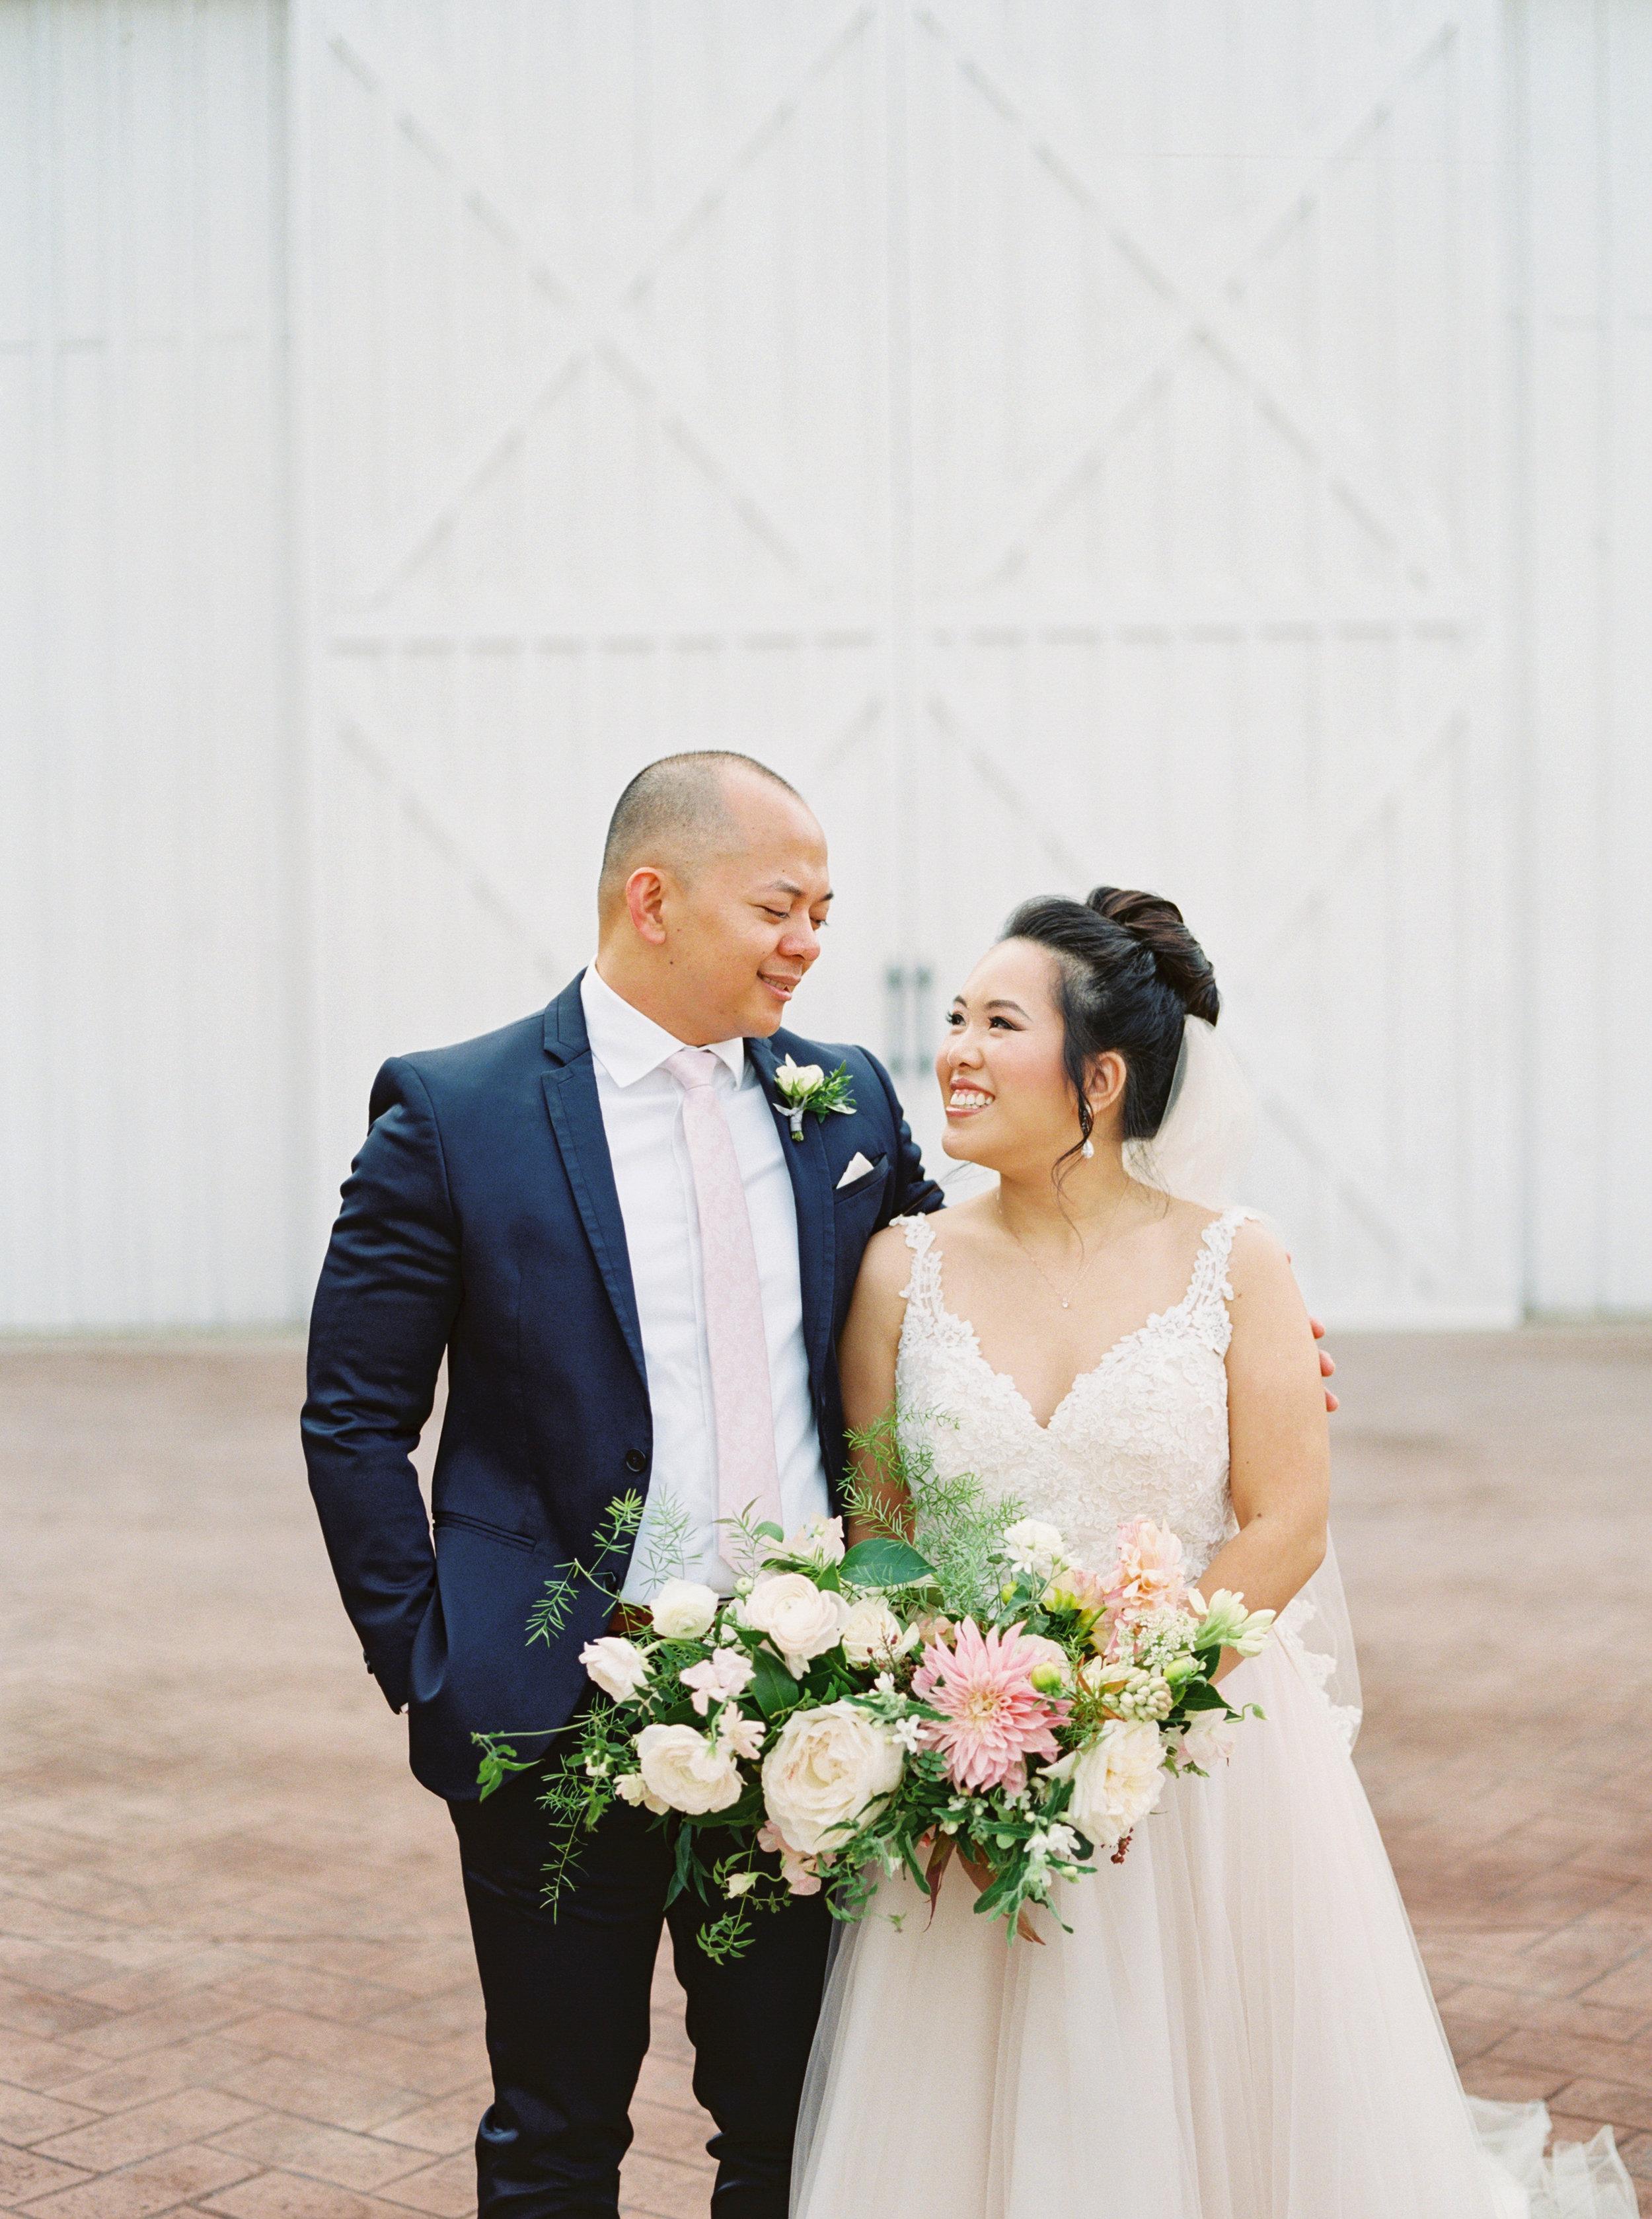 Lucy+JB Wedding_276 copy.JPG